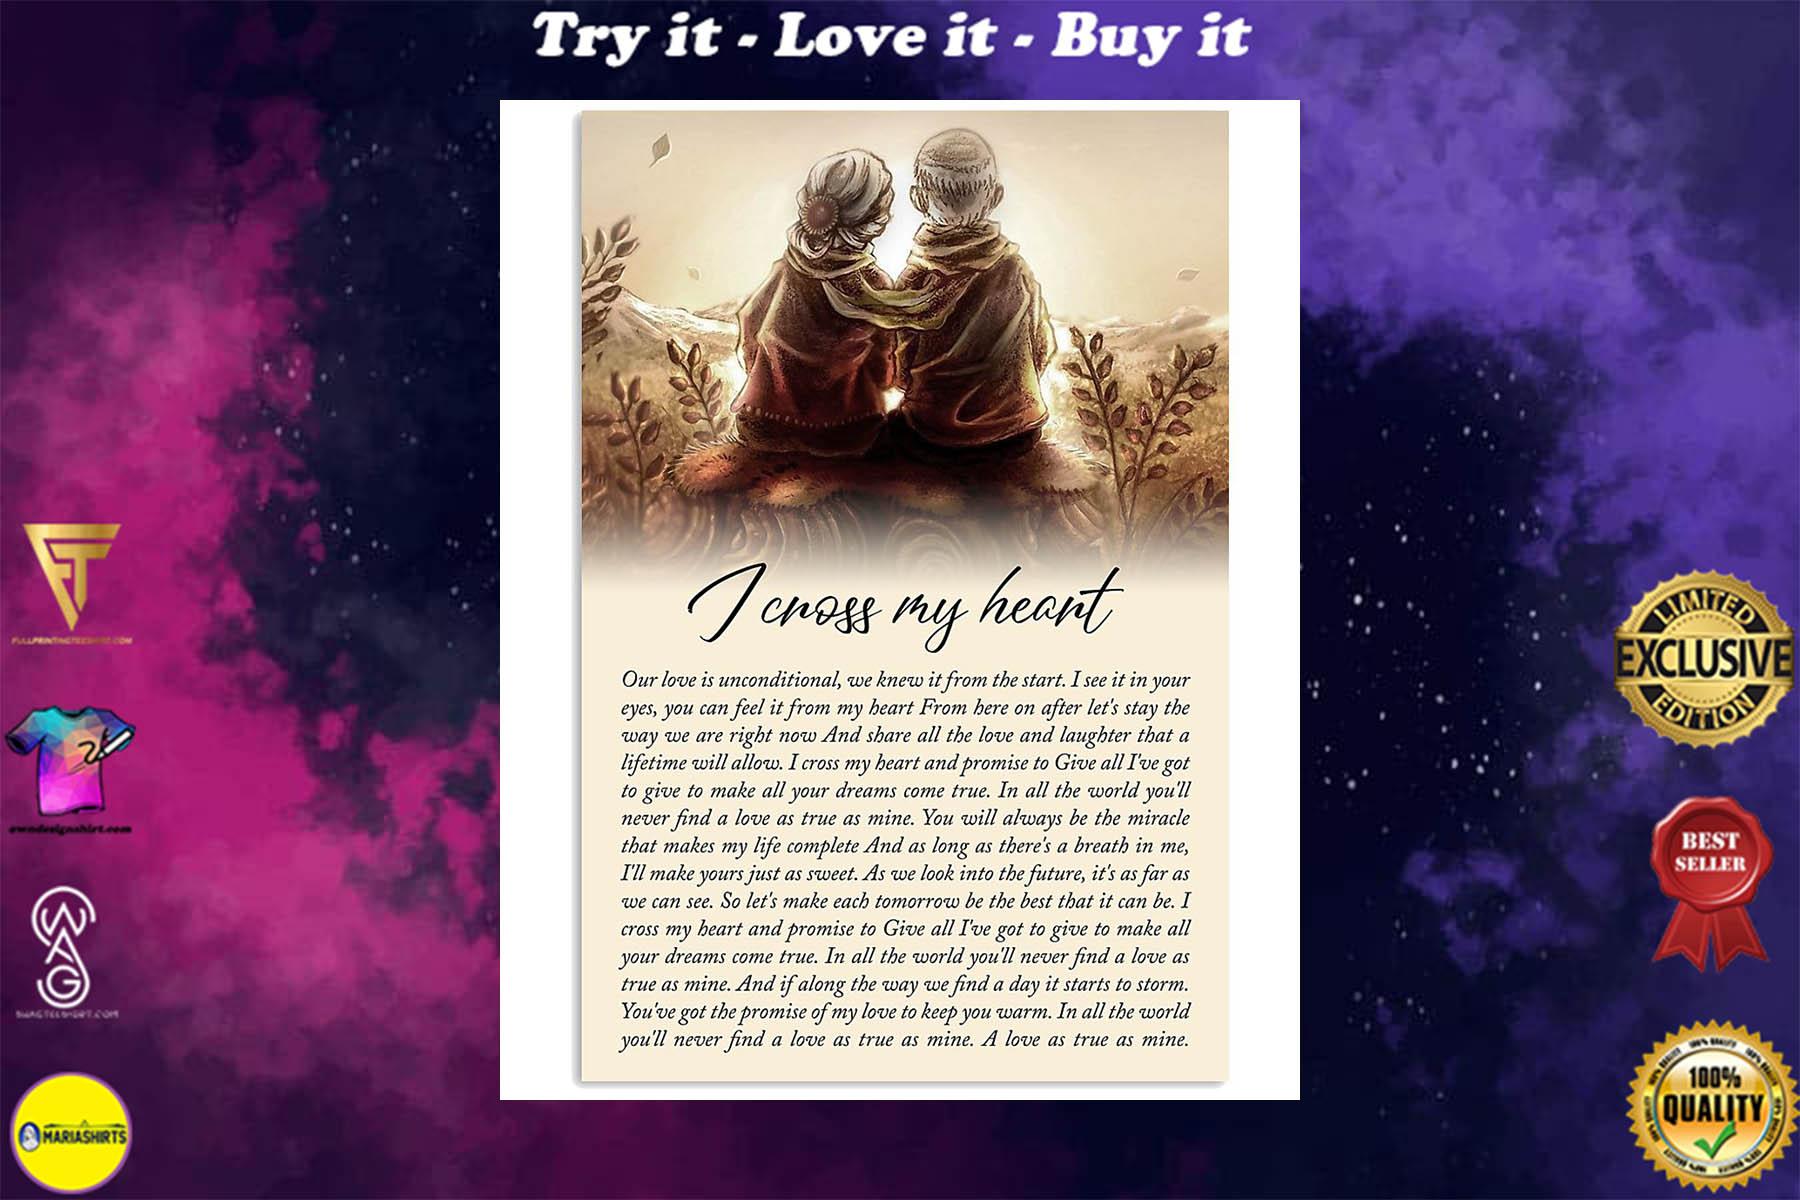 george strait i cross my heart lyrics couple in love poster